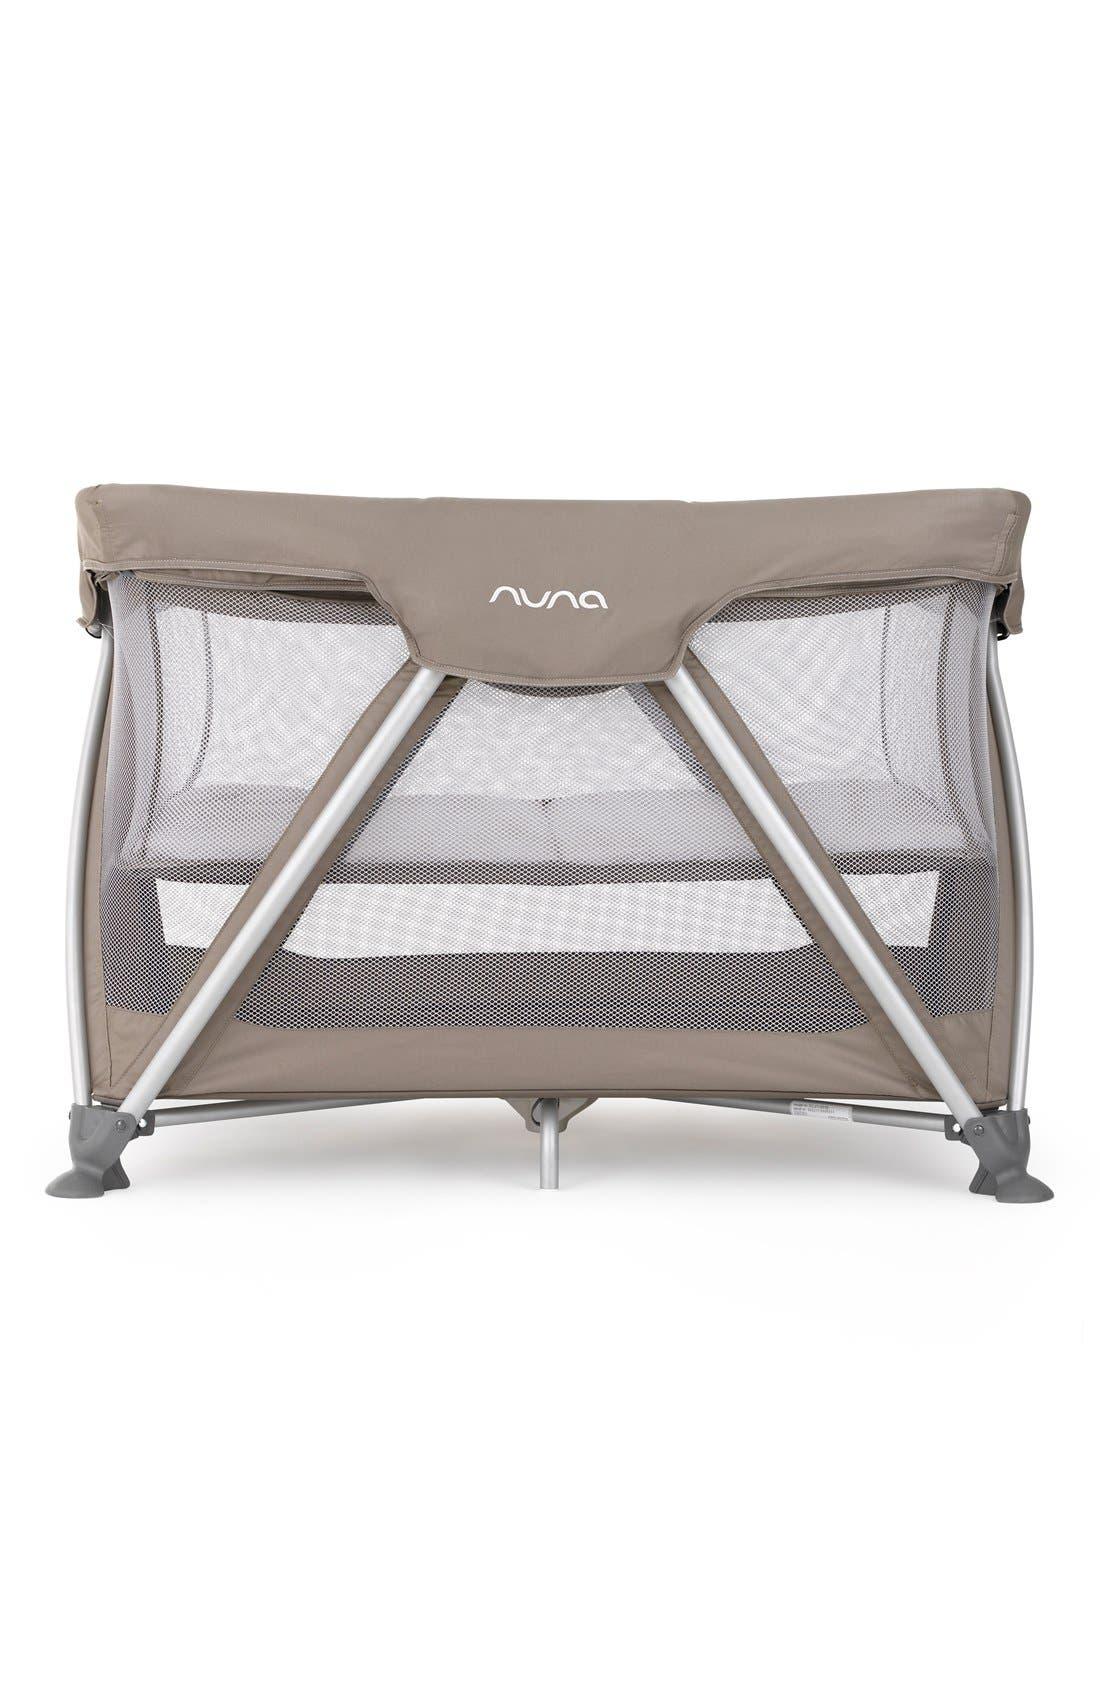 Alternate Image 1 Selected - nuna 'SENA™' Travel Crib